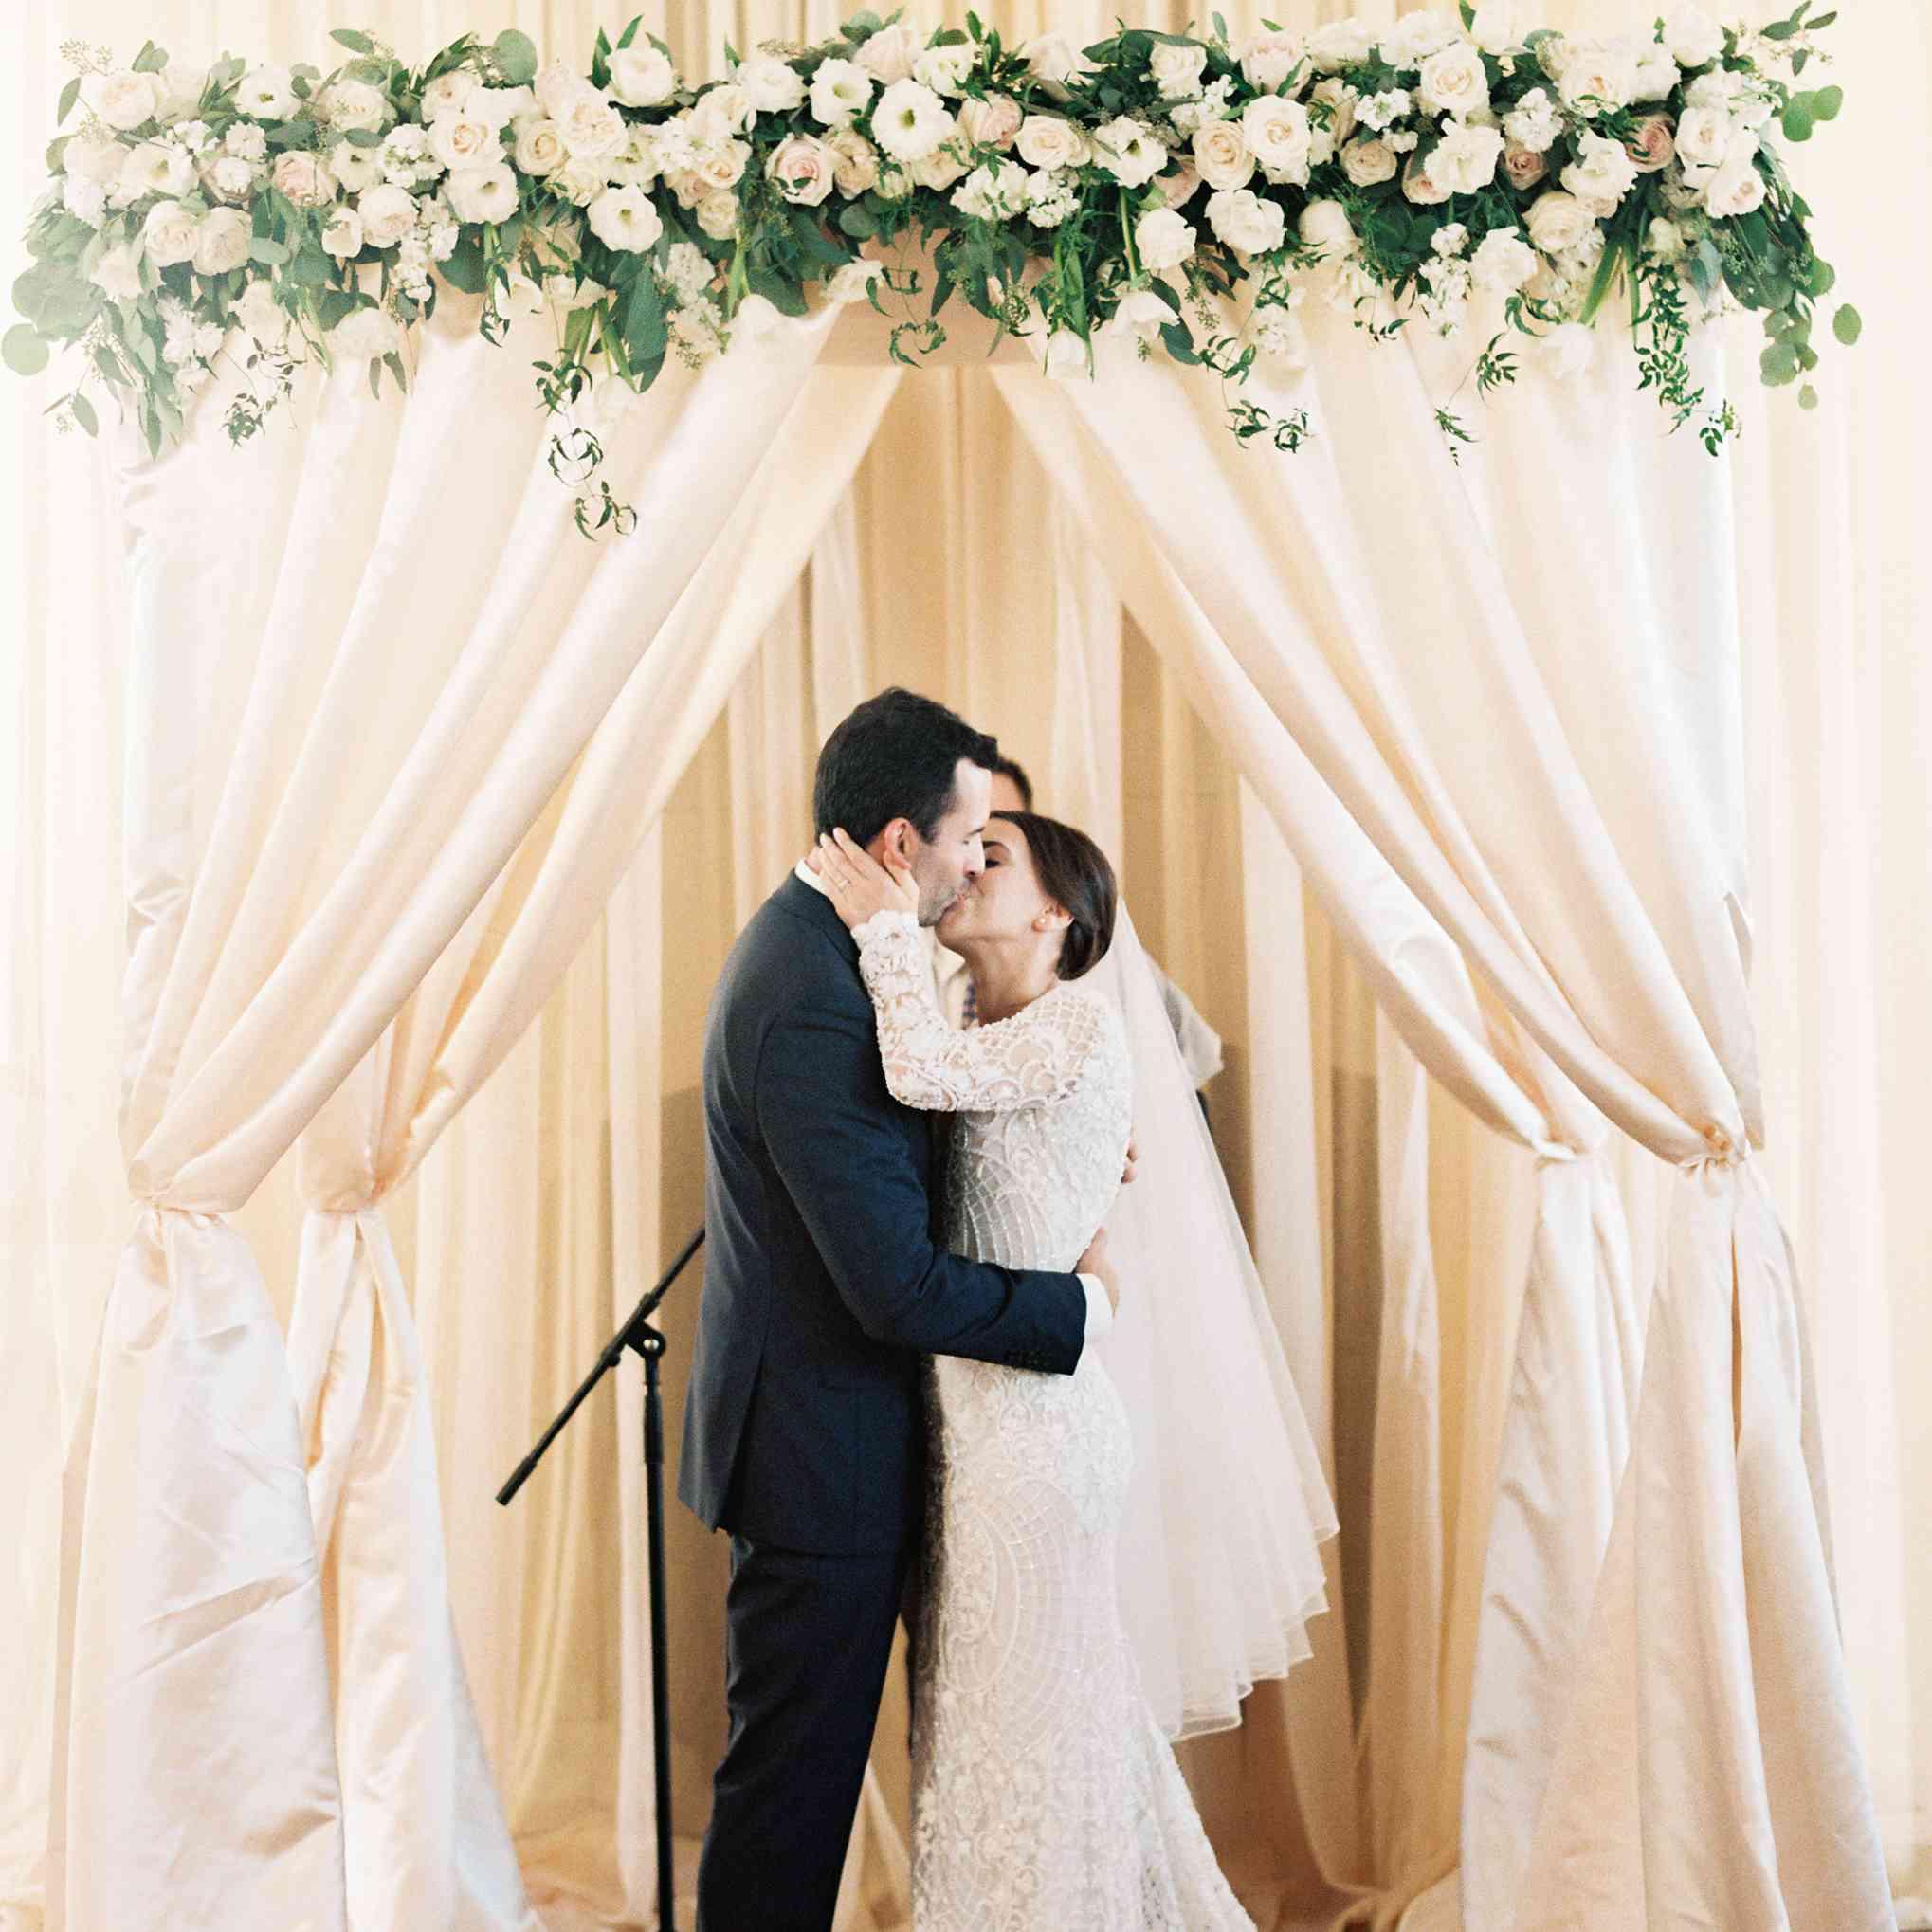 Bride and groom kiss under chuppah